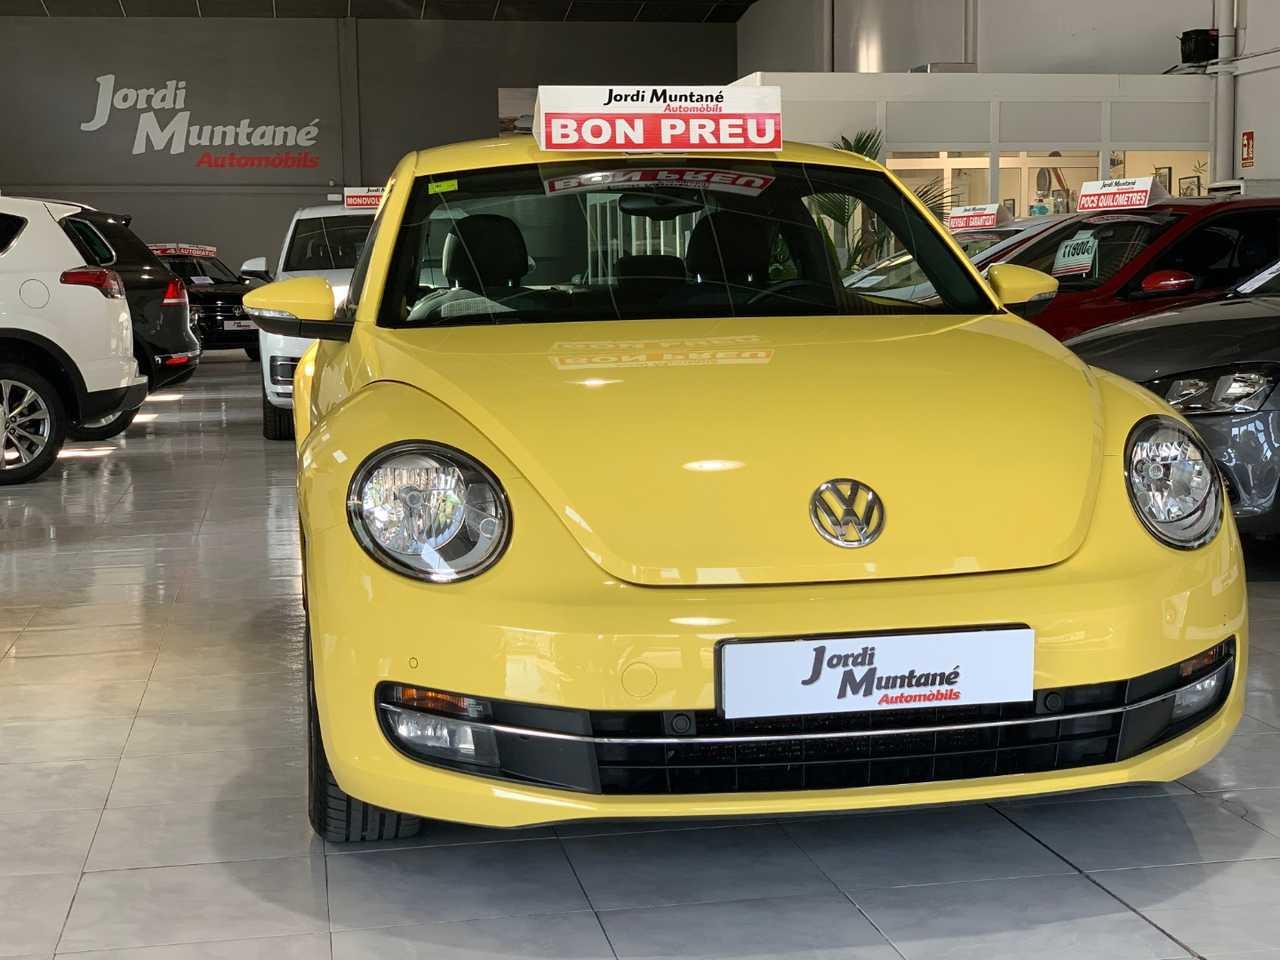 Volkswagen New Beetle 1.2 TSI 105cv -. '' IMPECABLE '' .- Totalmente Revisado -.